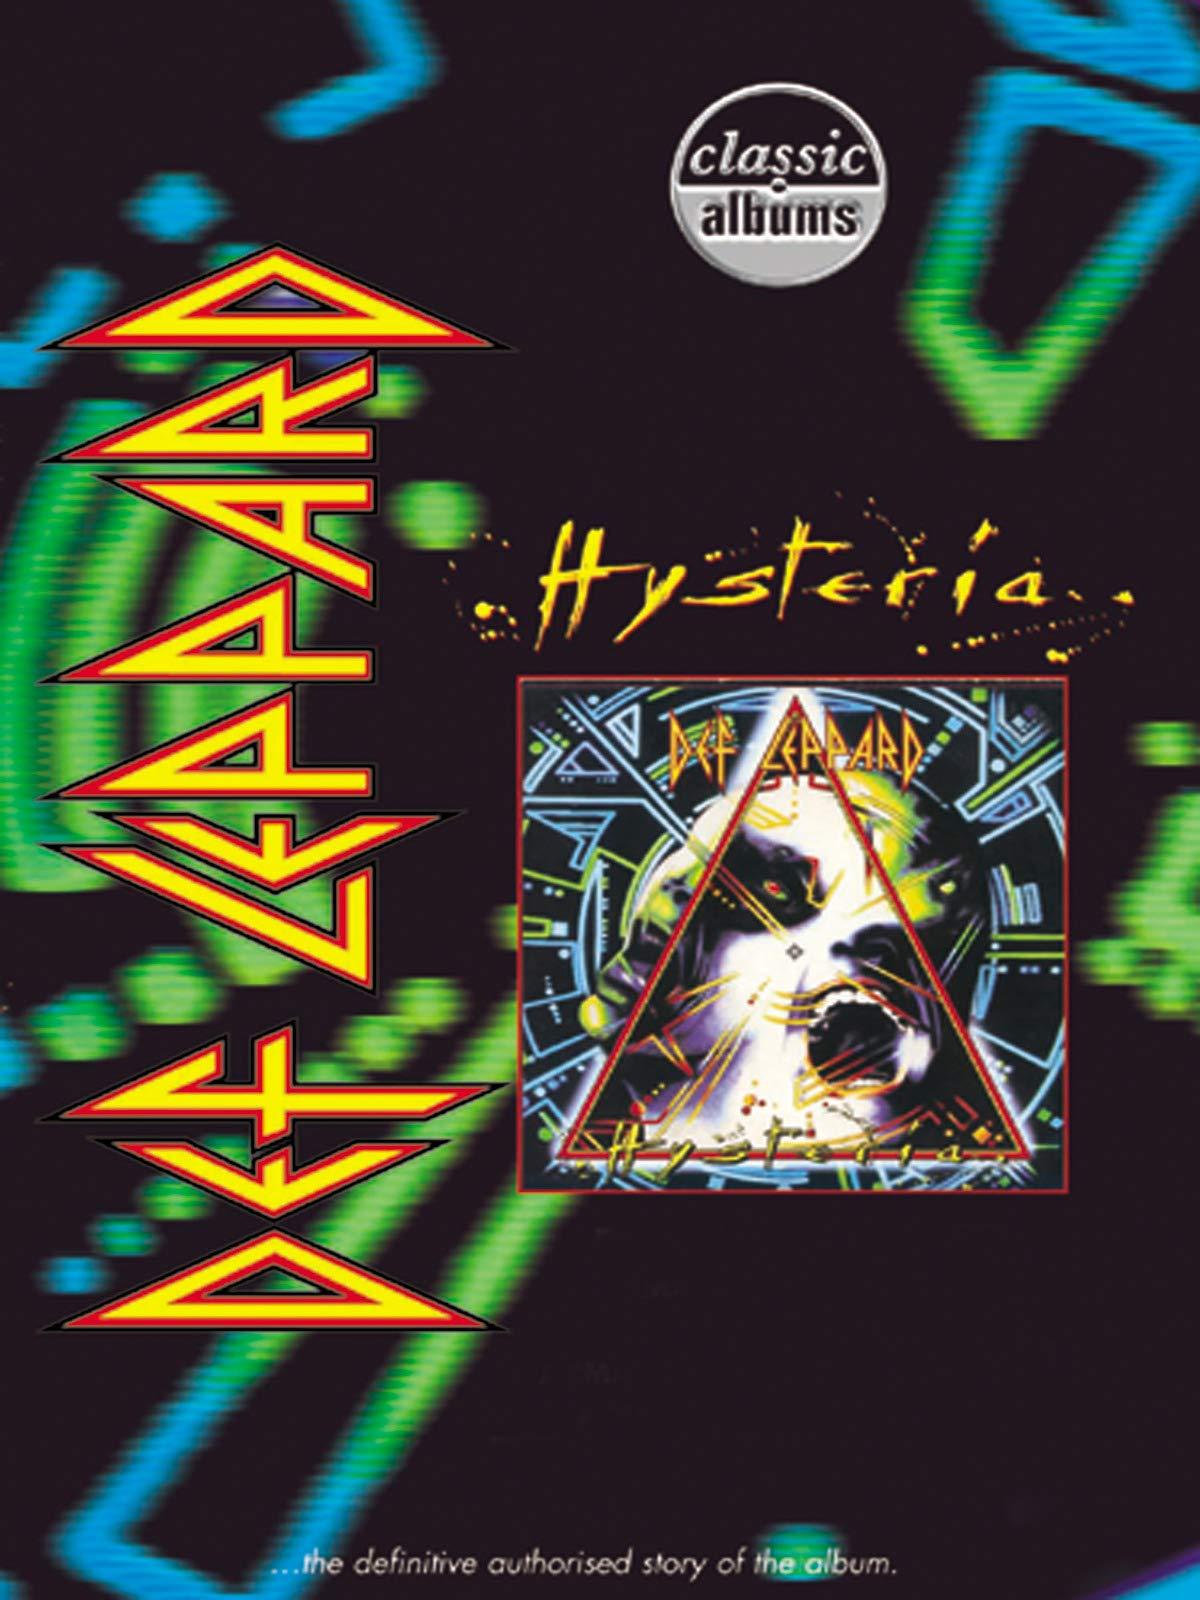 Def Leppard - Hysteria (Classic Album) on Amazon Prime Video UK